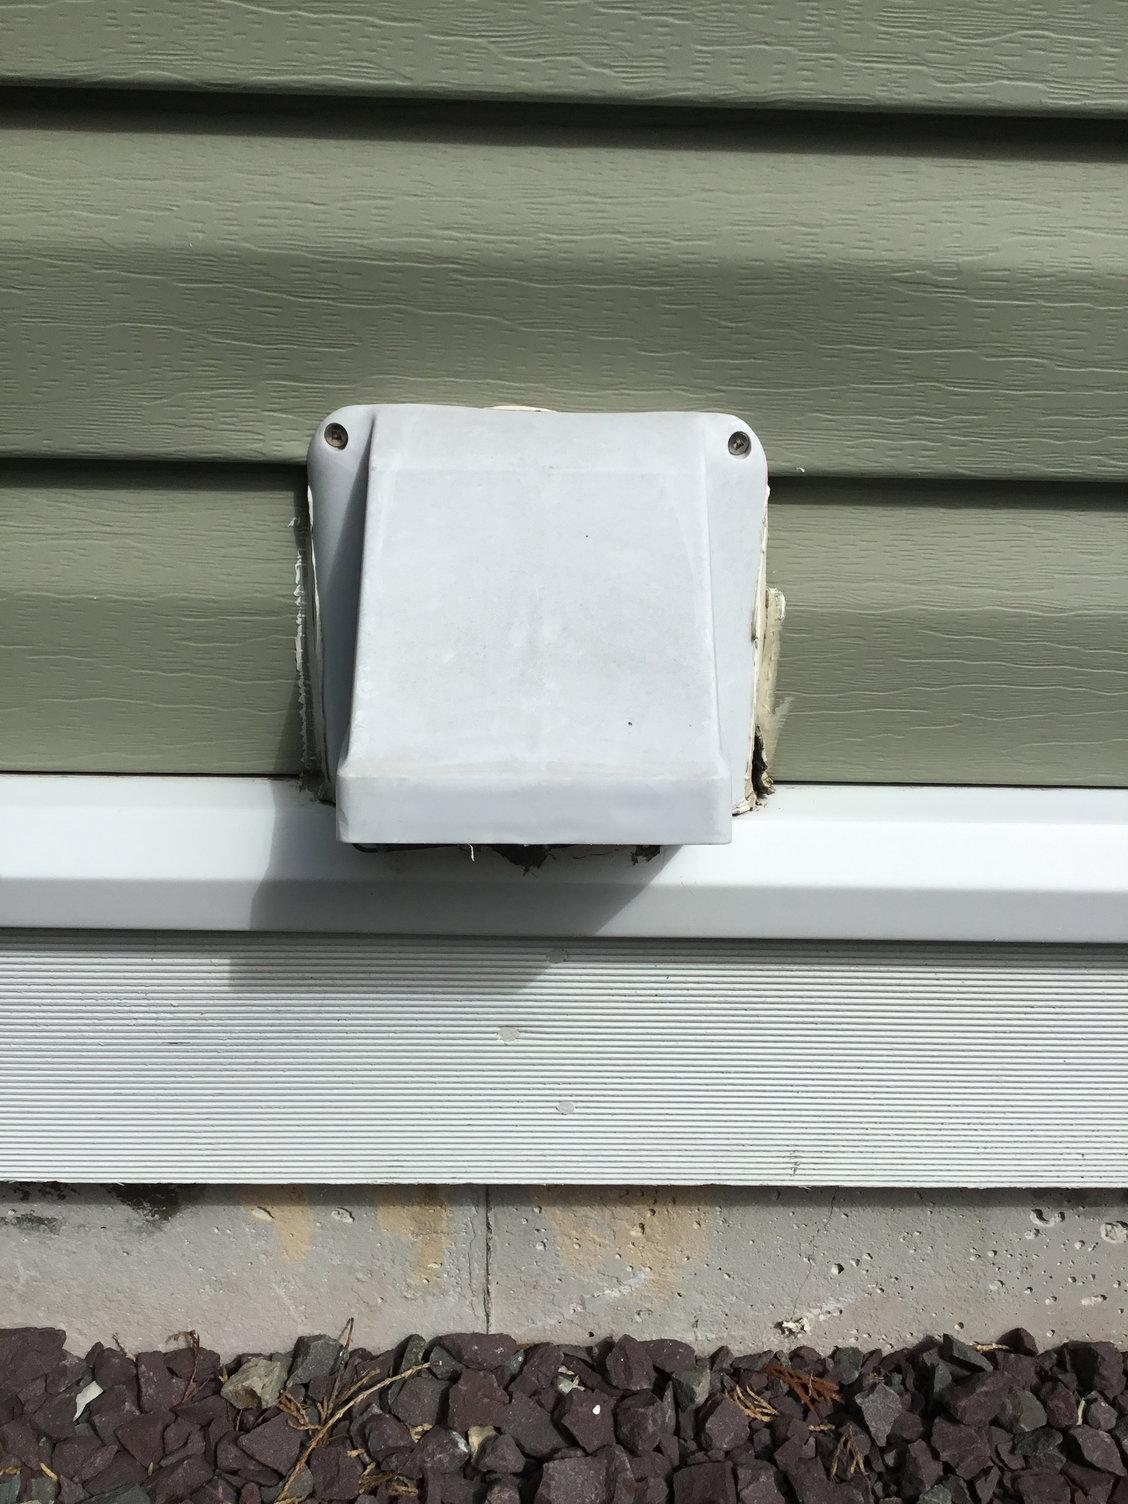 water around dryer vent vinyl siding